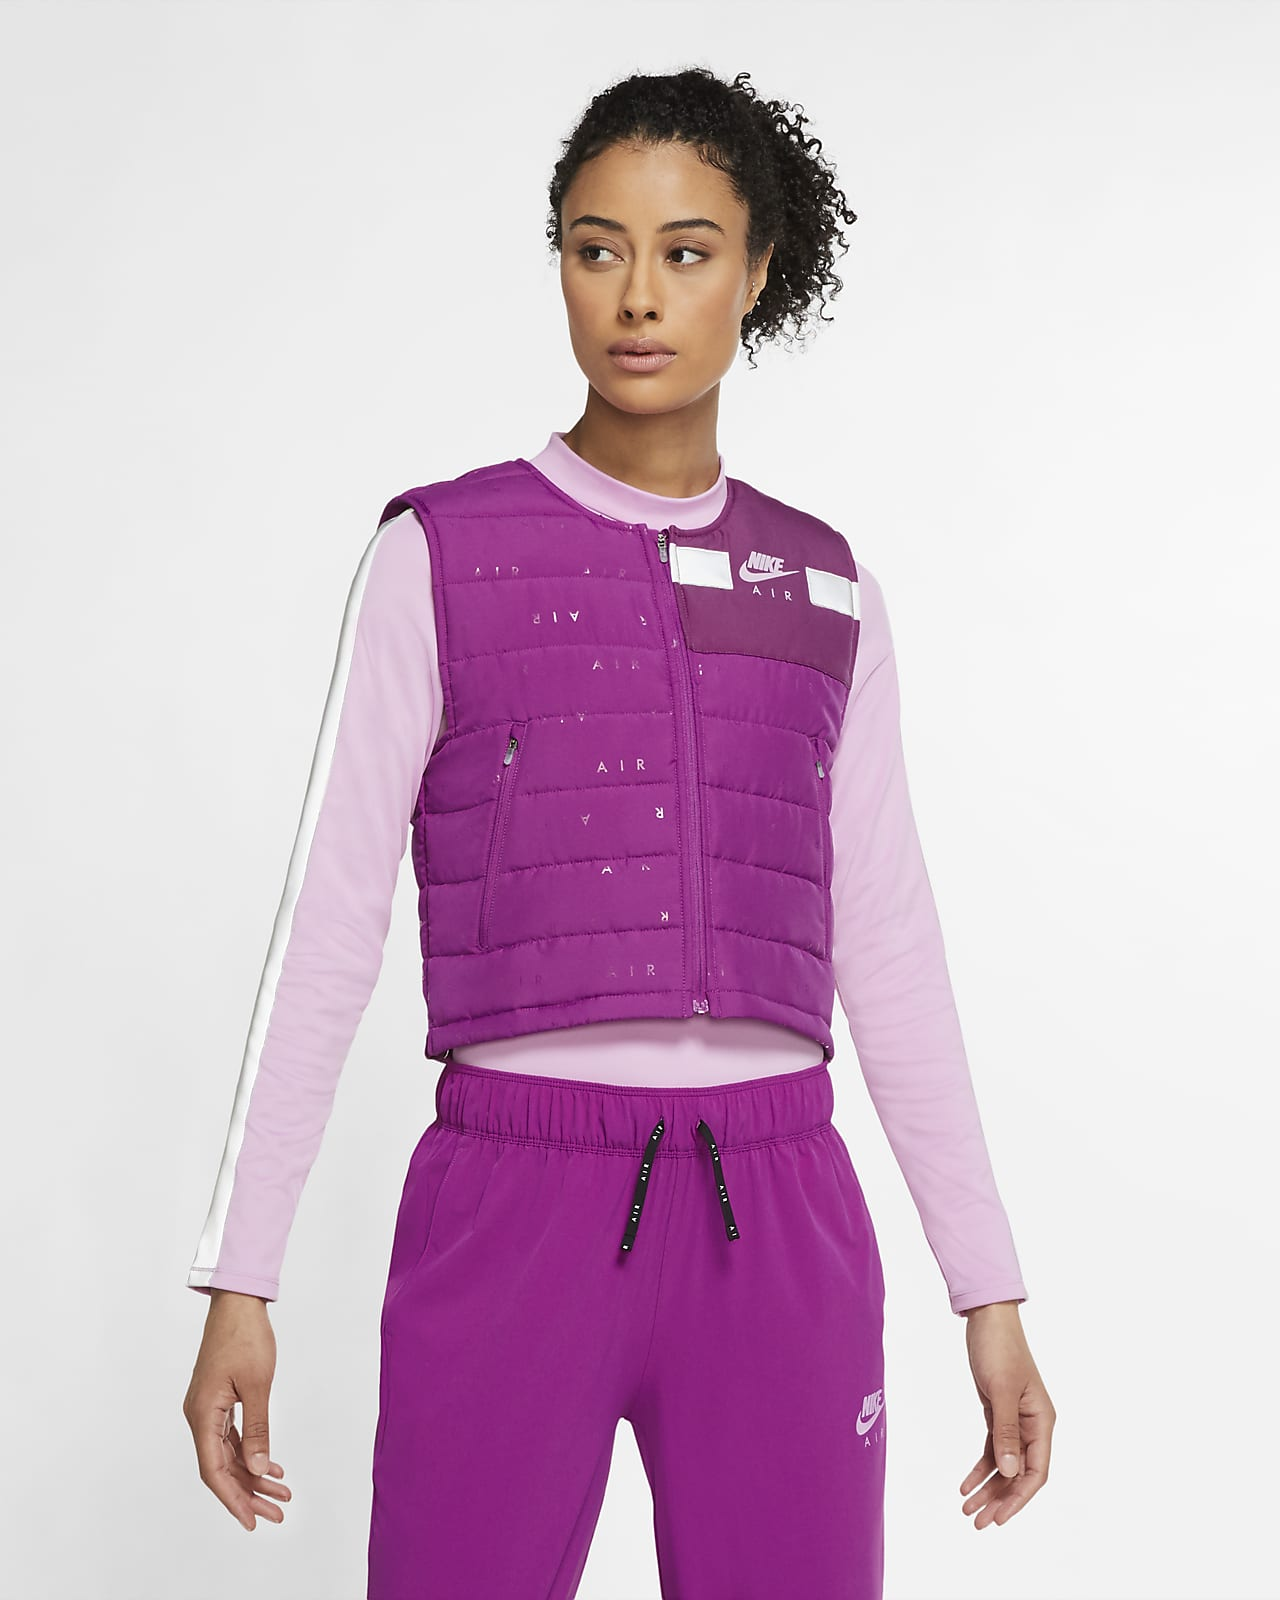 Nike Air Women's Running Gilet